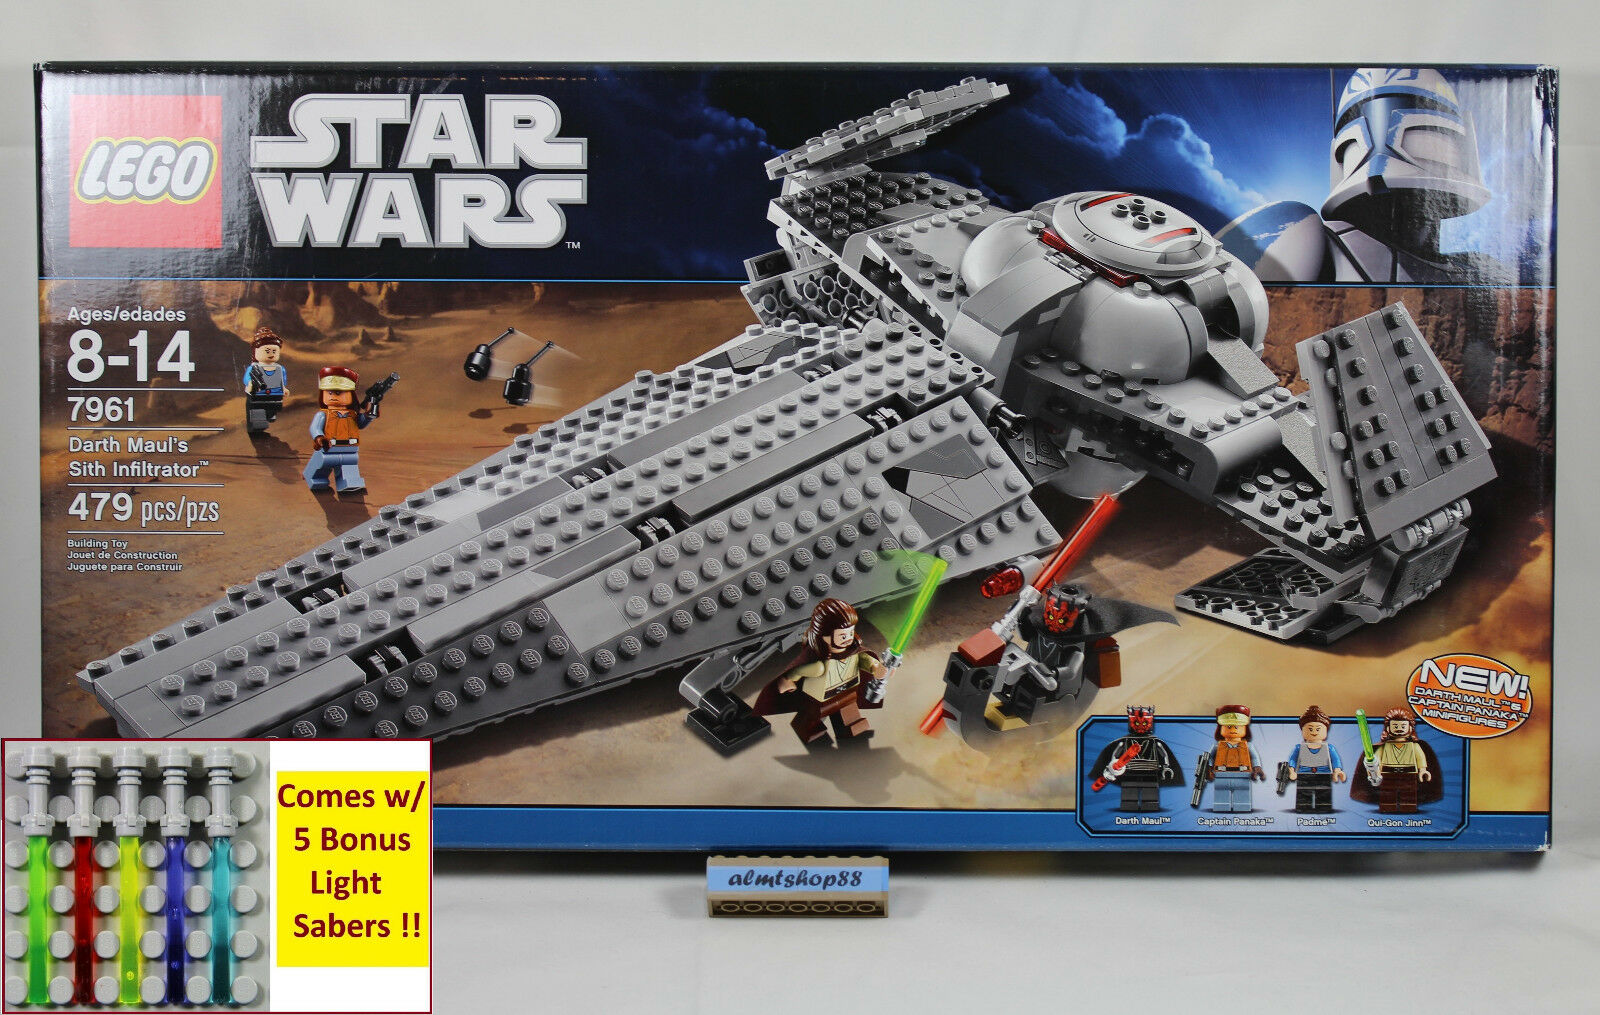 Lego Star Wars-Darth Maul's Sith Infiltrator 7961 NISB Padme quigon Minifigura